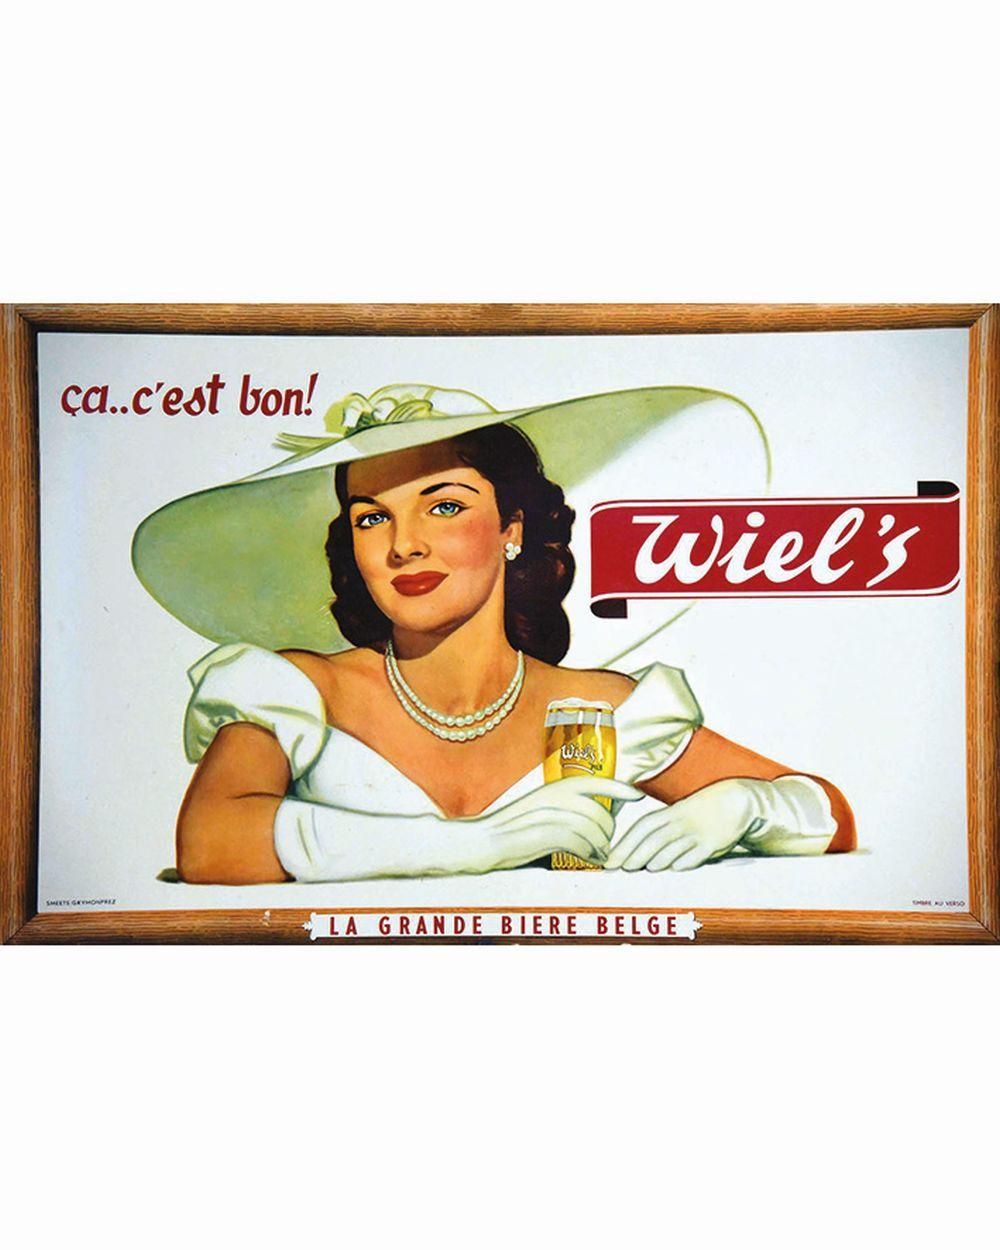 Wiel's Ah ça c'est bond La Garnde Bière Belge     vers 1950